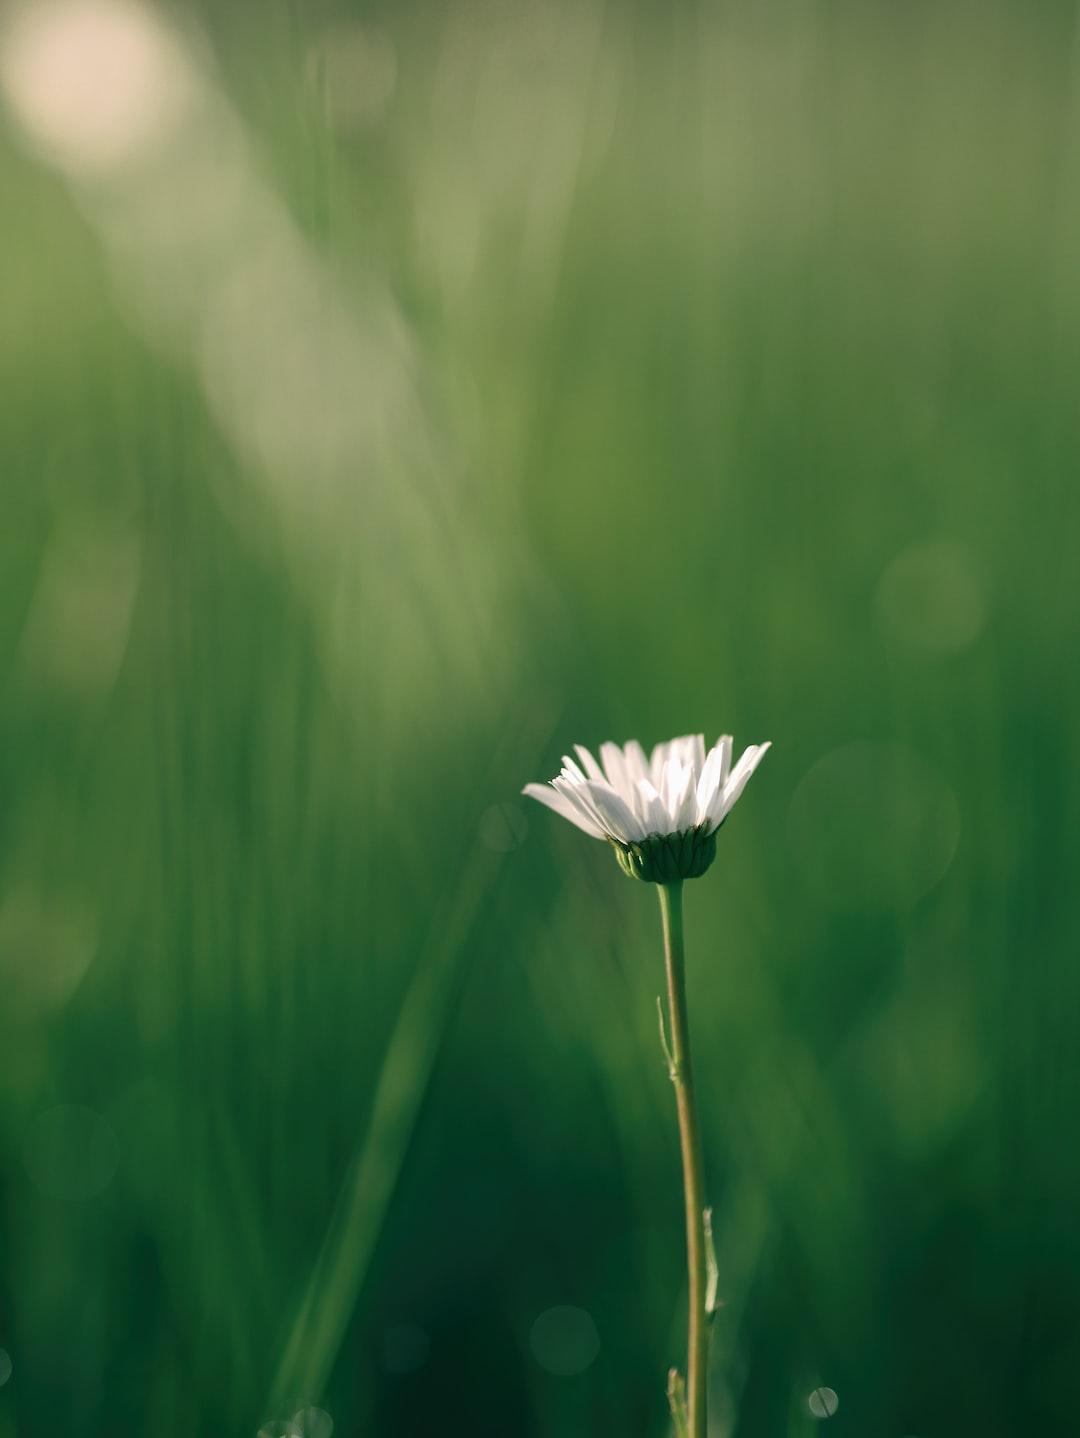 Sunshine on a white daisy